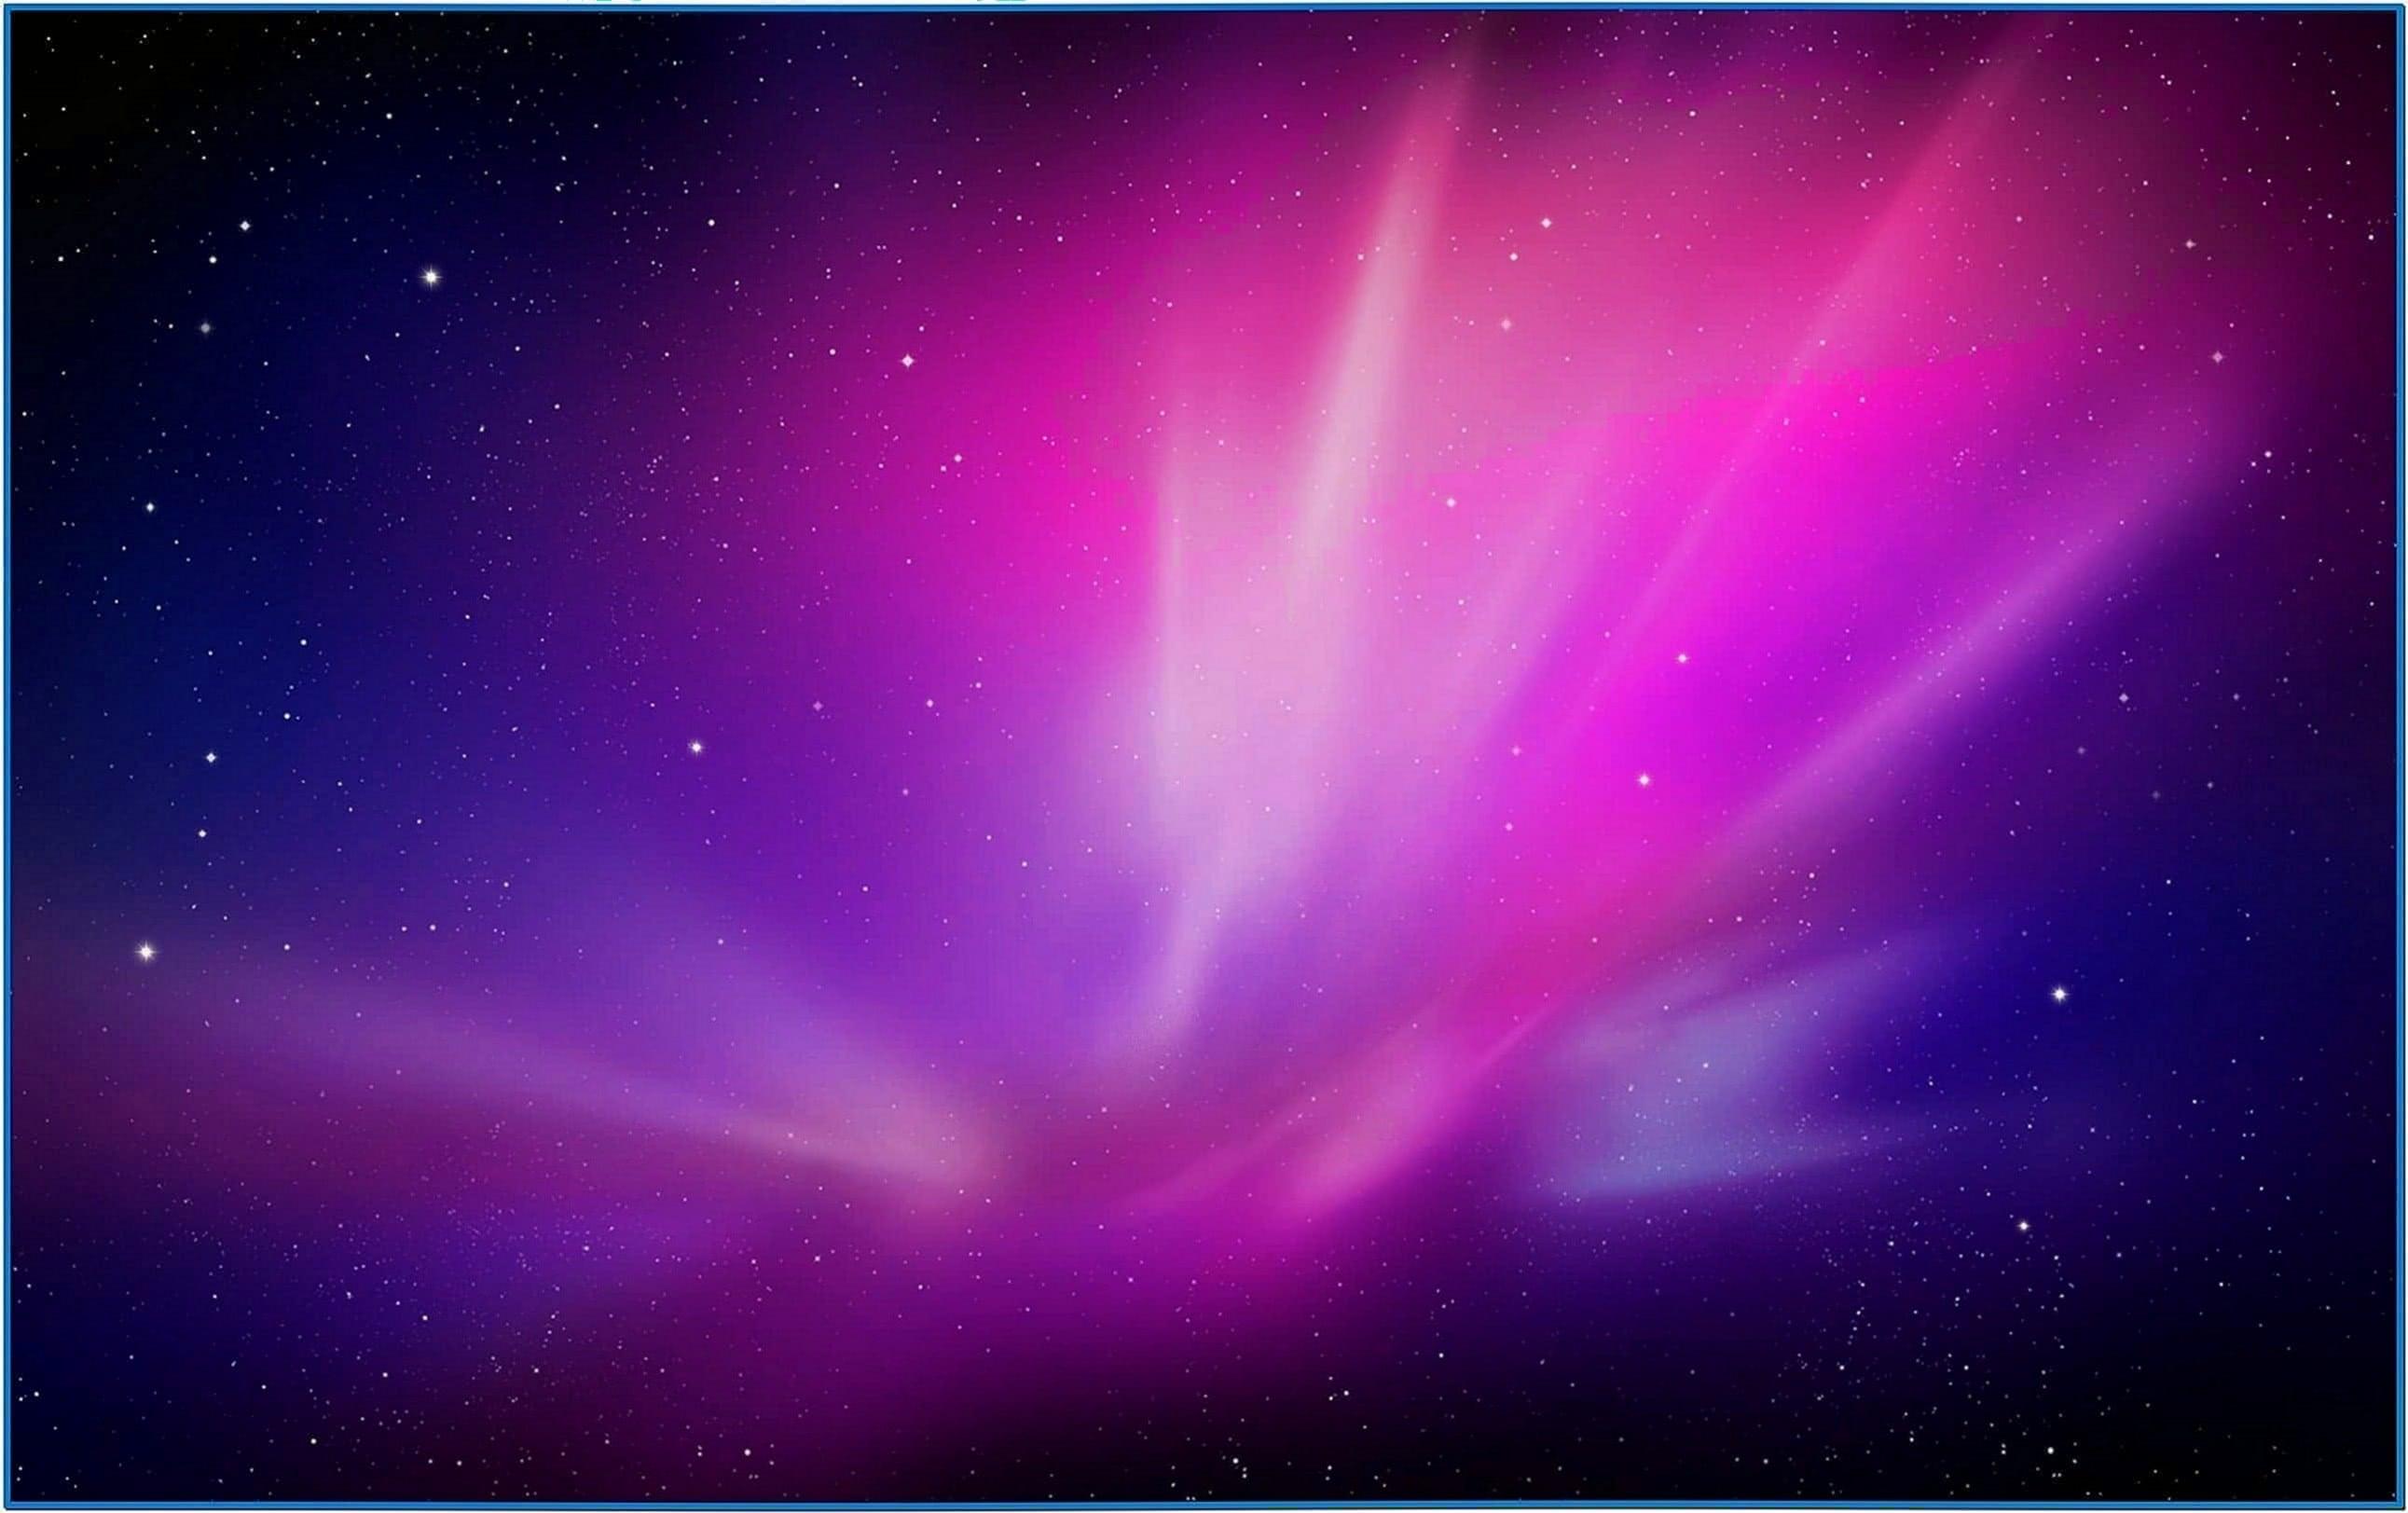 Download free screensavers for macbook pro desktop